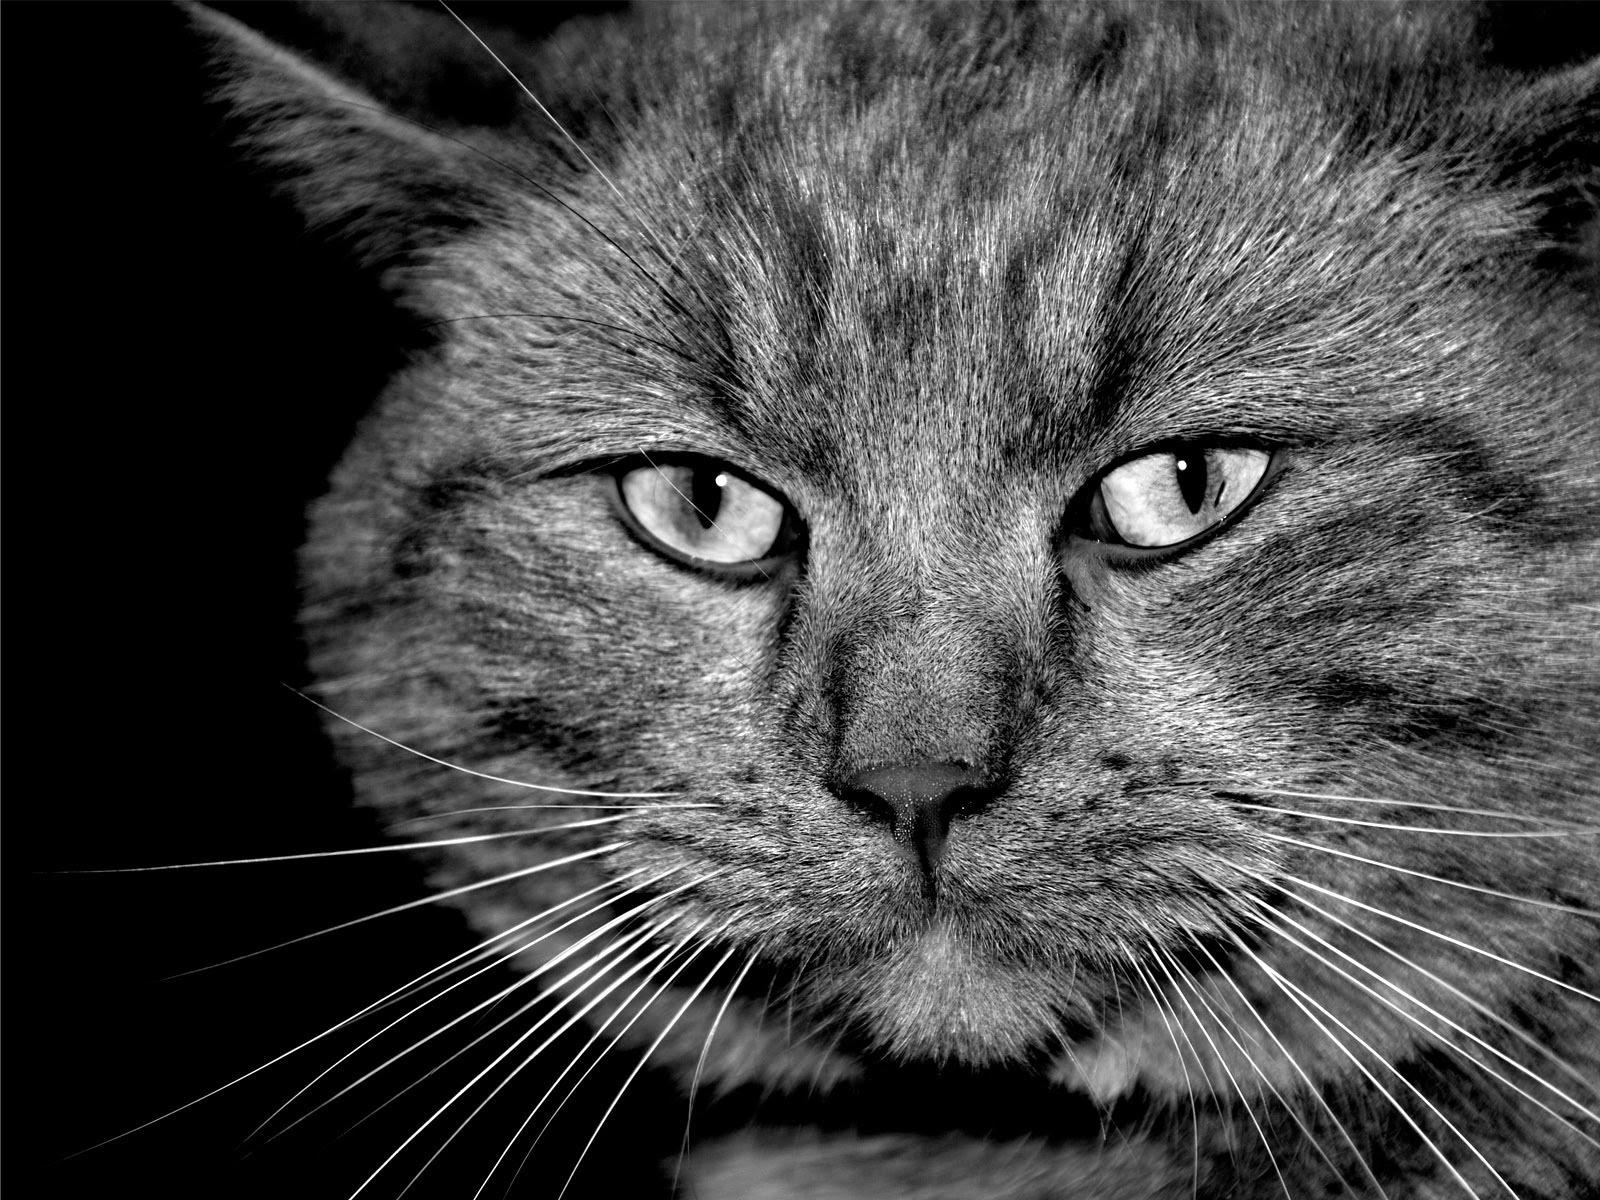 World Best Car Hd Wallpaper 1080p Tiptop 3d Amp Hd Wallpapers Collection Beautiful Cats